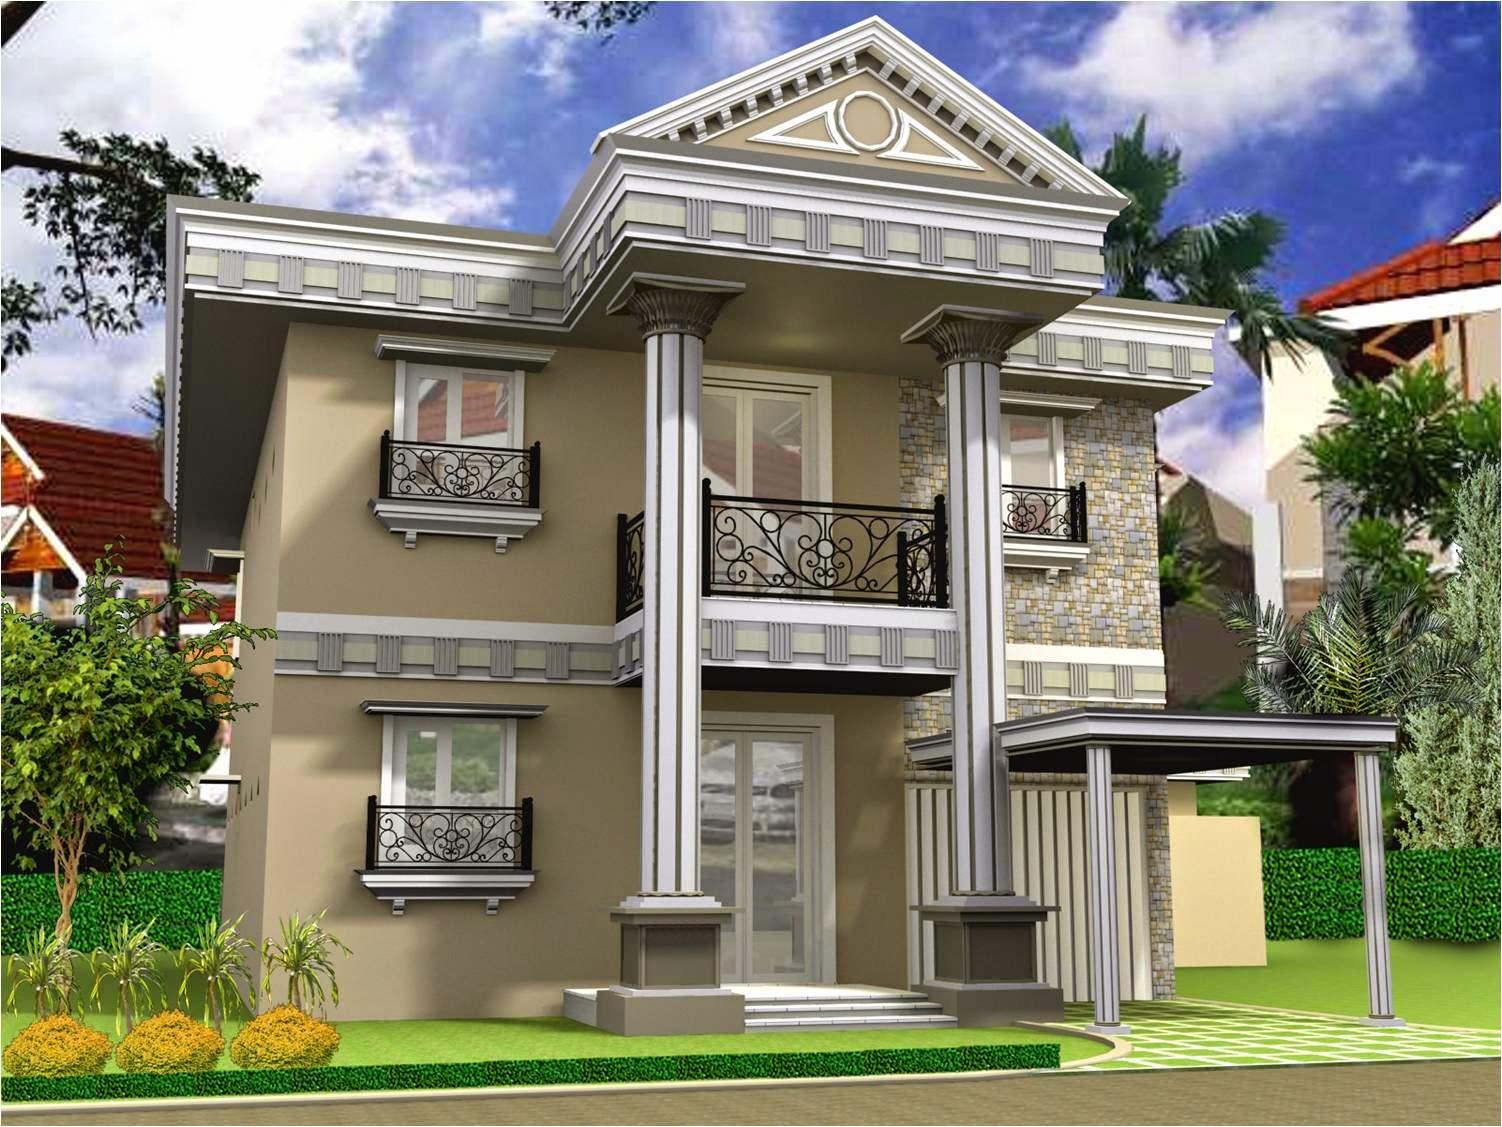 home improvement design luxury home design minimalist latest nd home improvement design luxury home design minimalist - Latest Home Designs